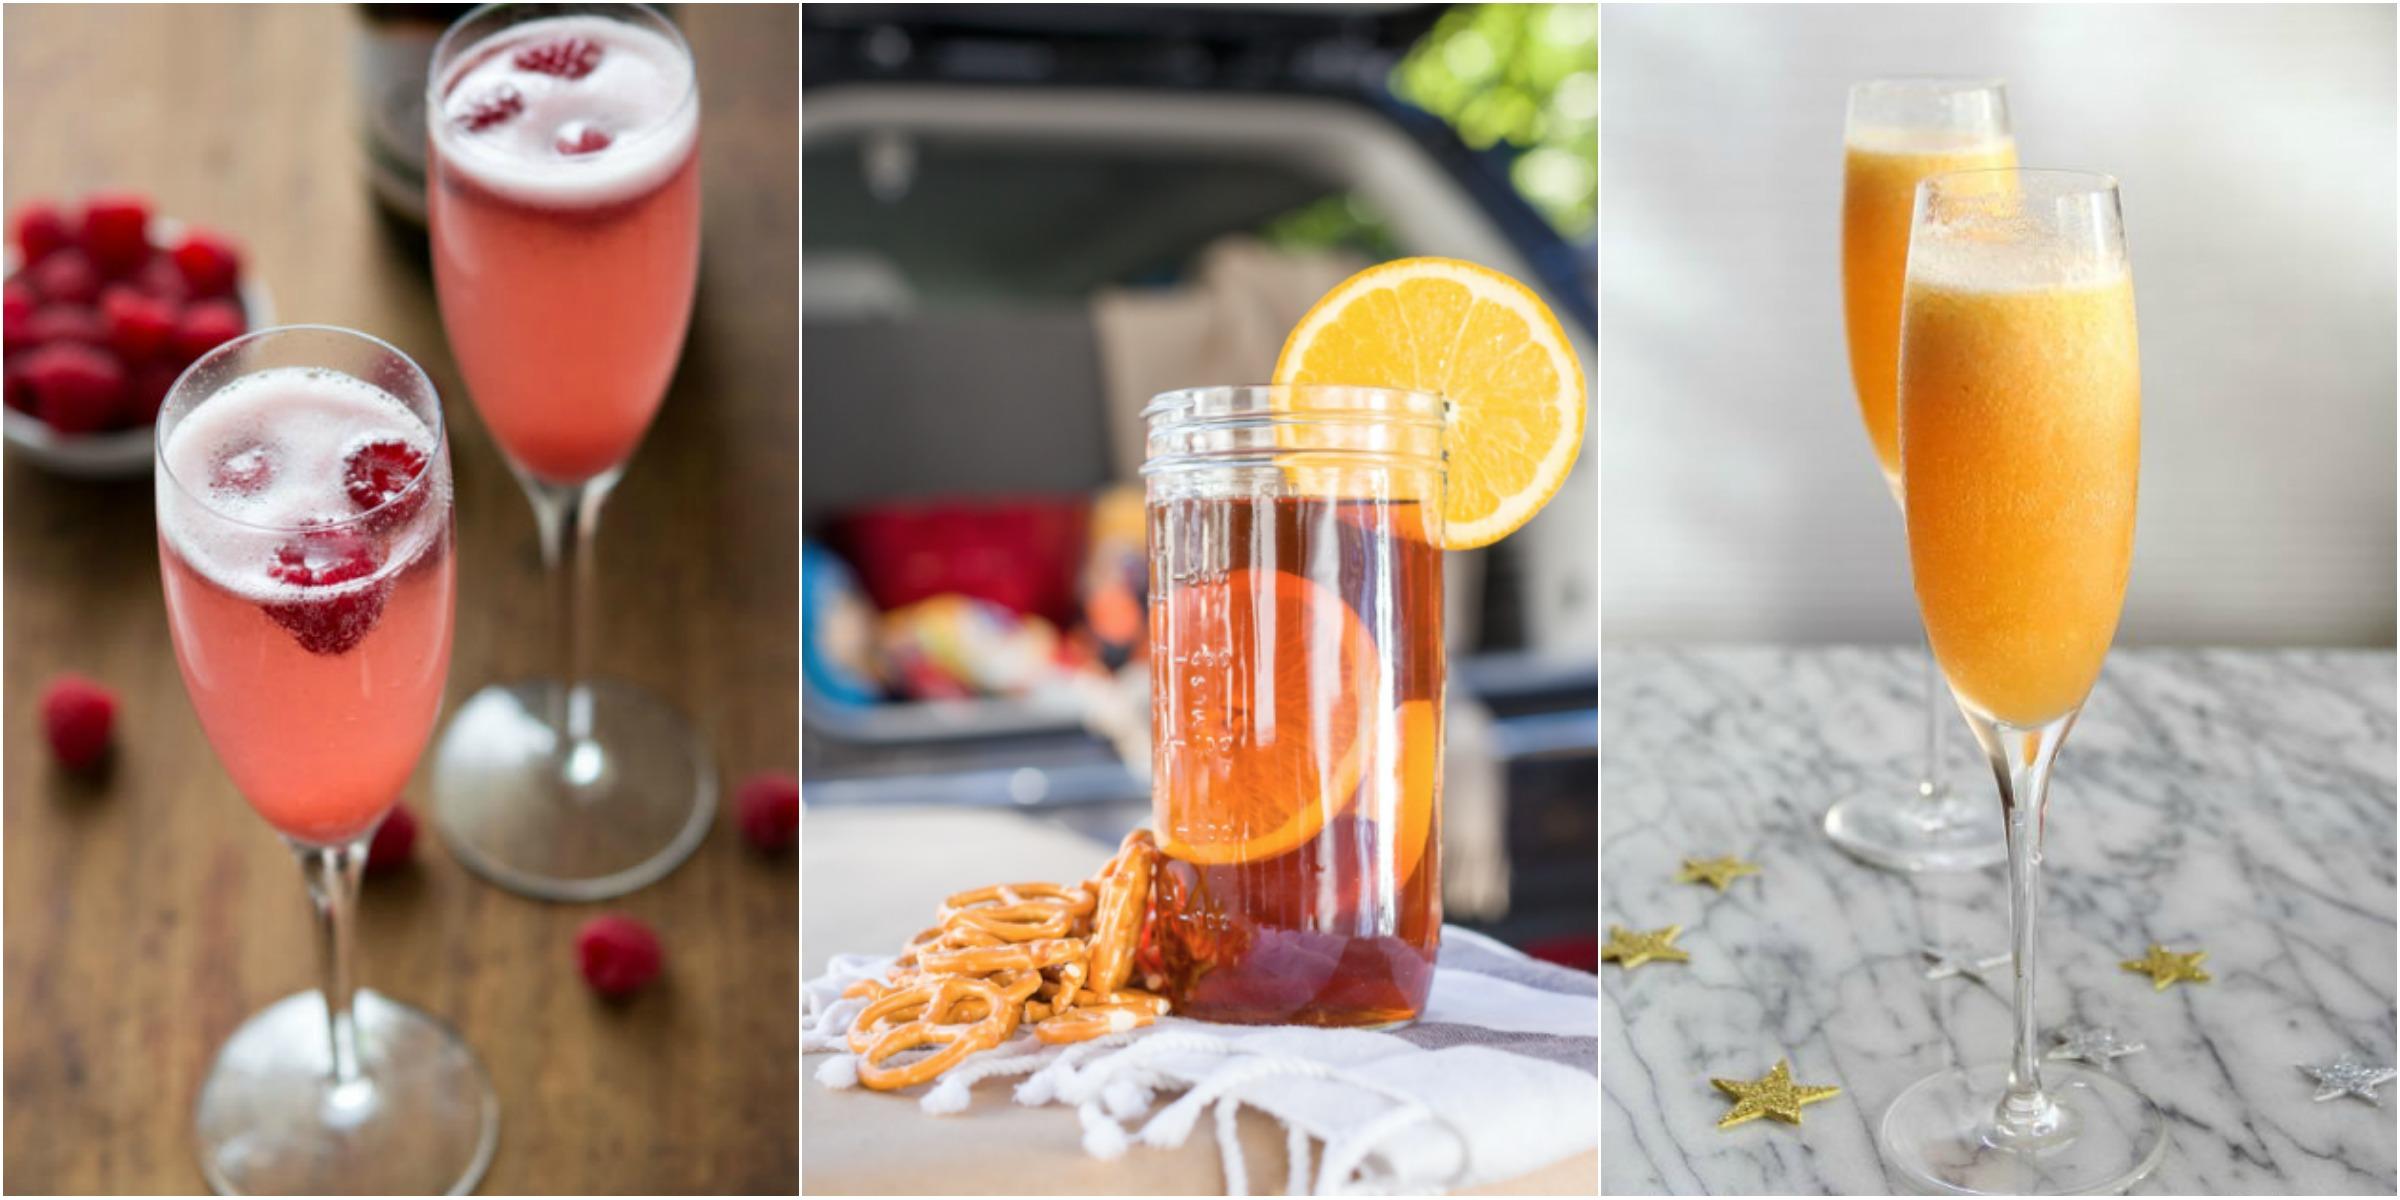 11 Best Brunch Cocktails  Alcoholic Drink Recipes for